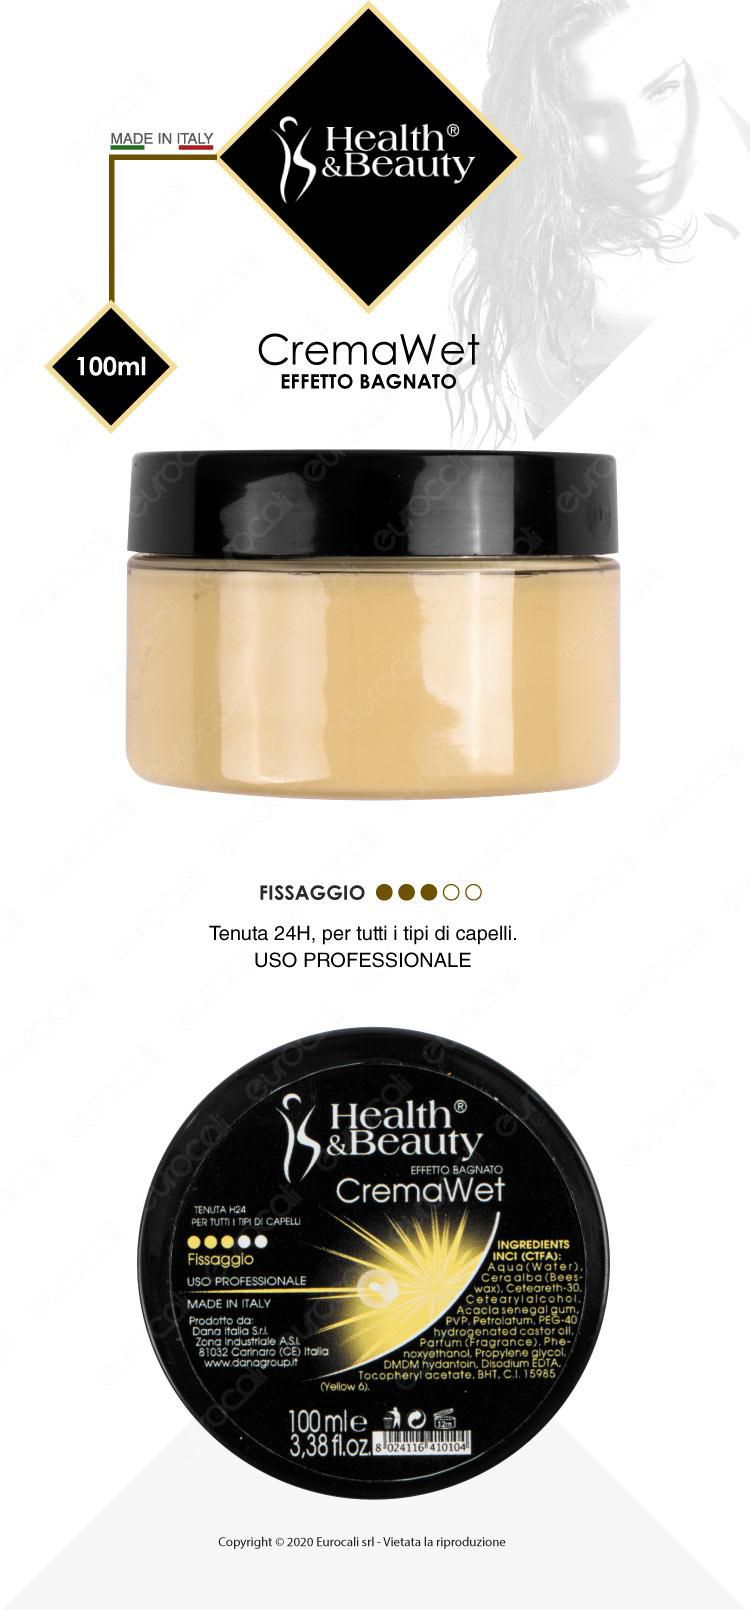 Health & Beauty Crema Wet